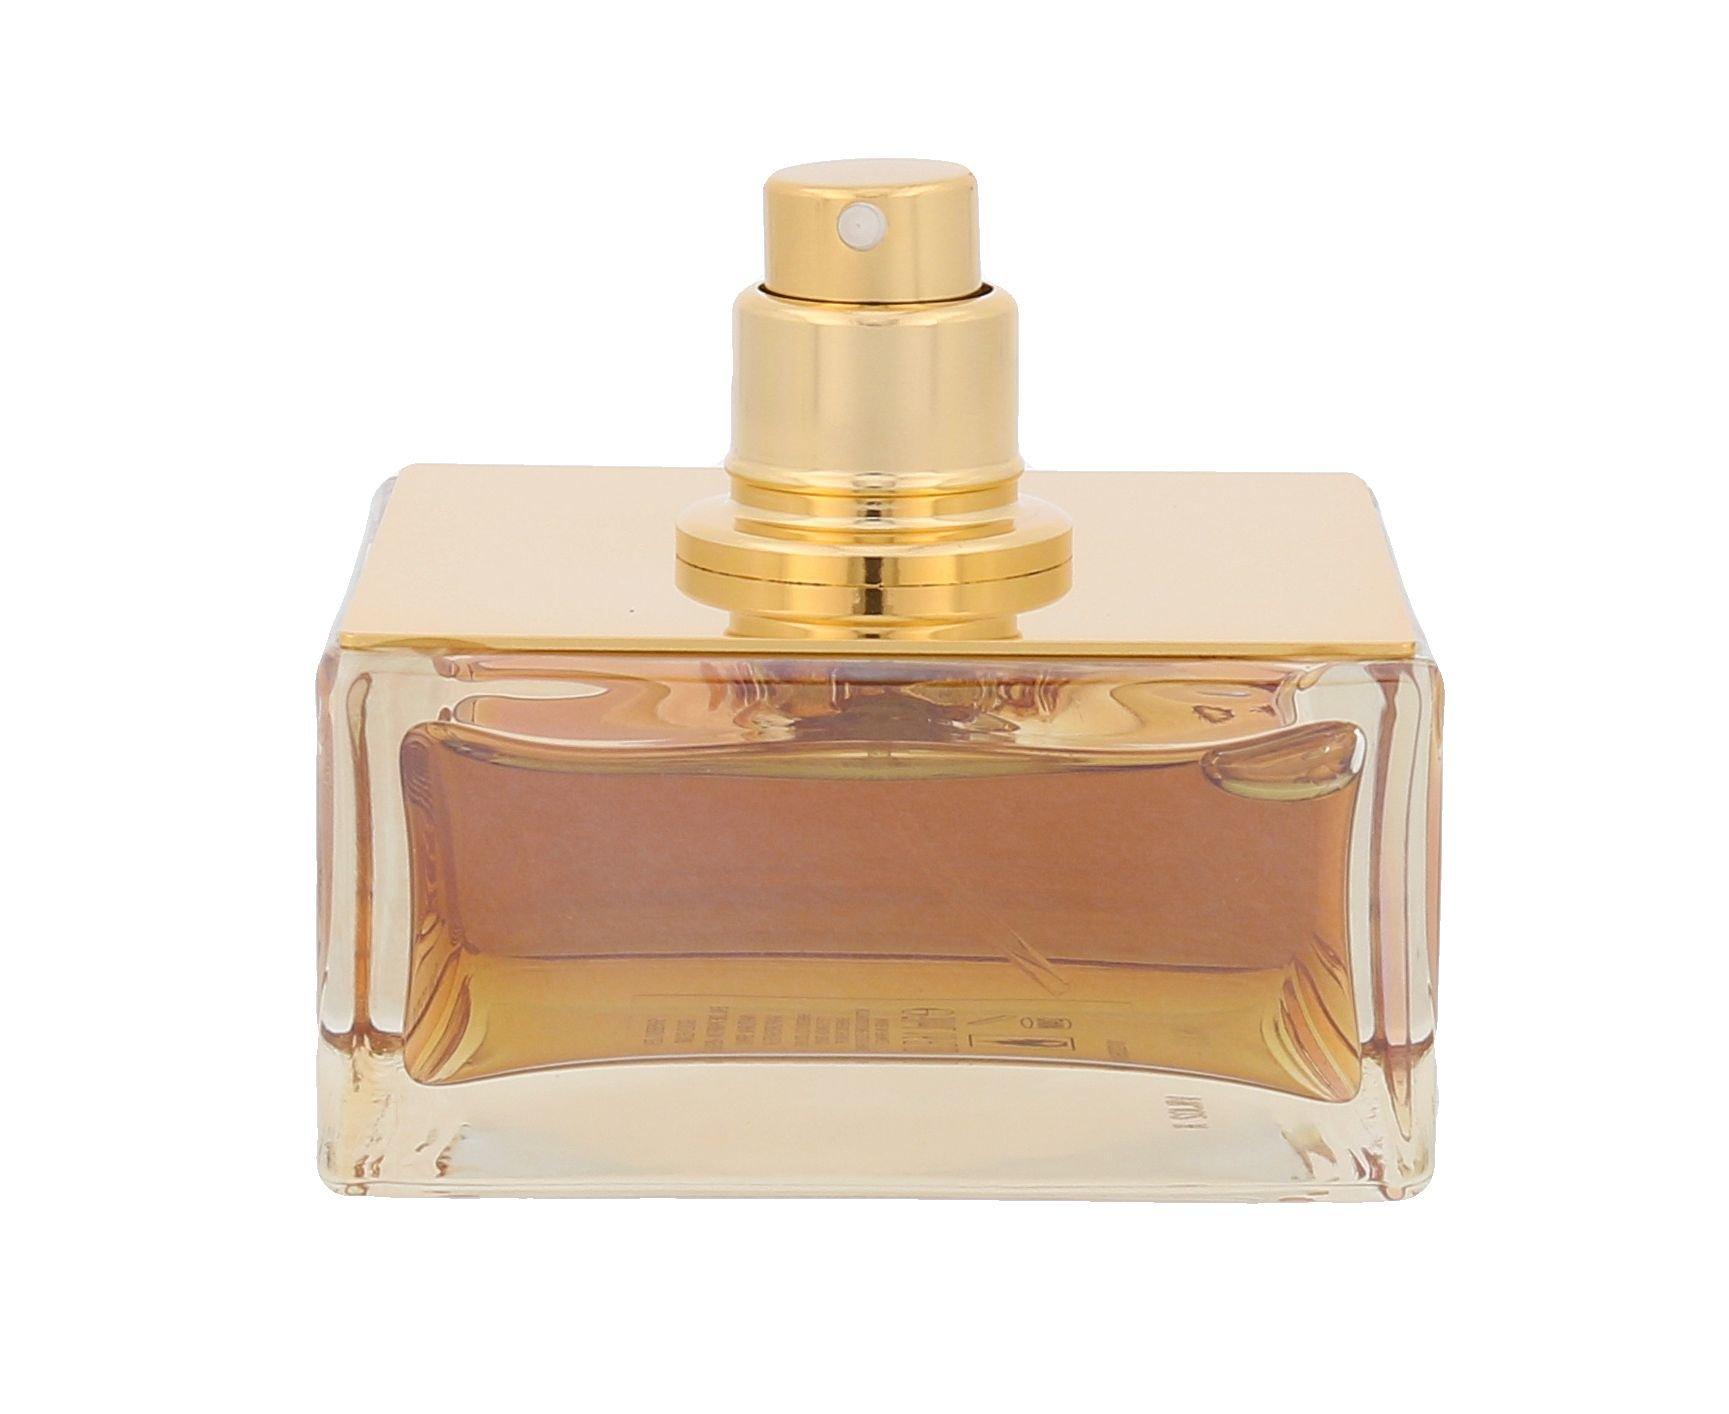 Shiseido Zen Gold Elixir EDP 50ml